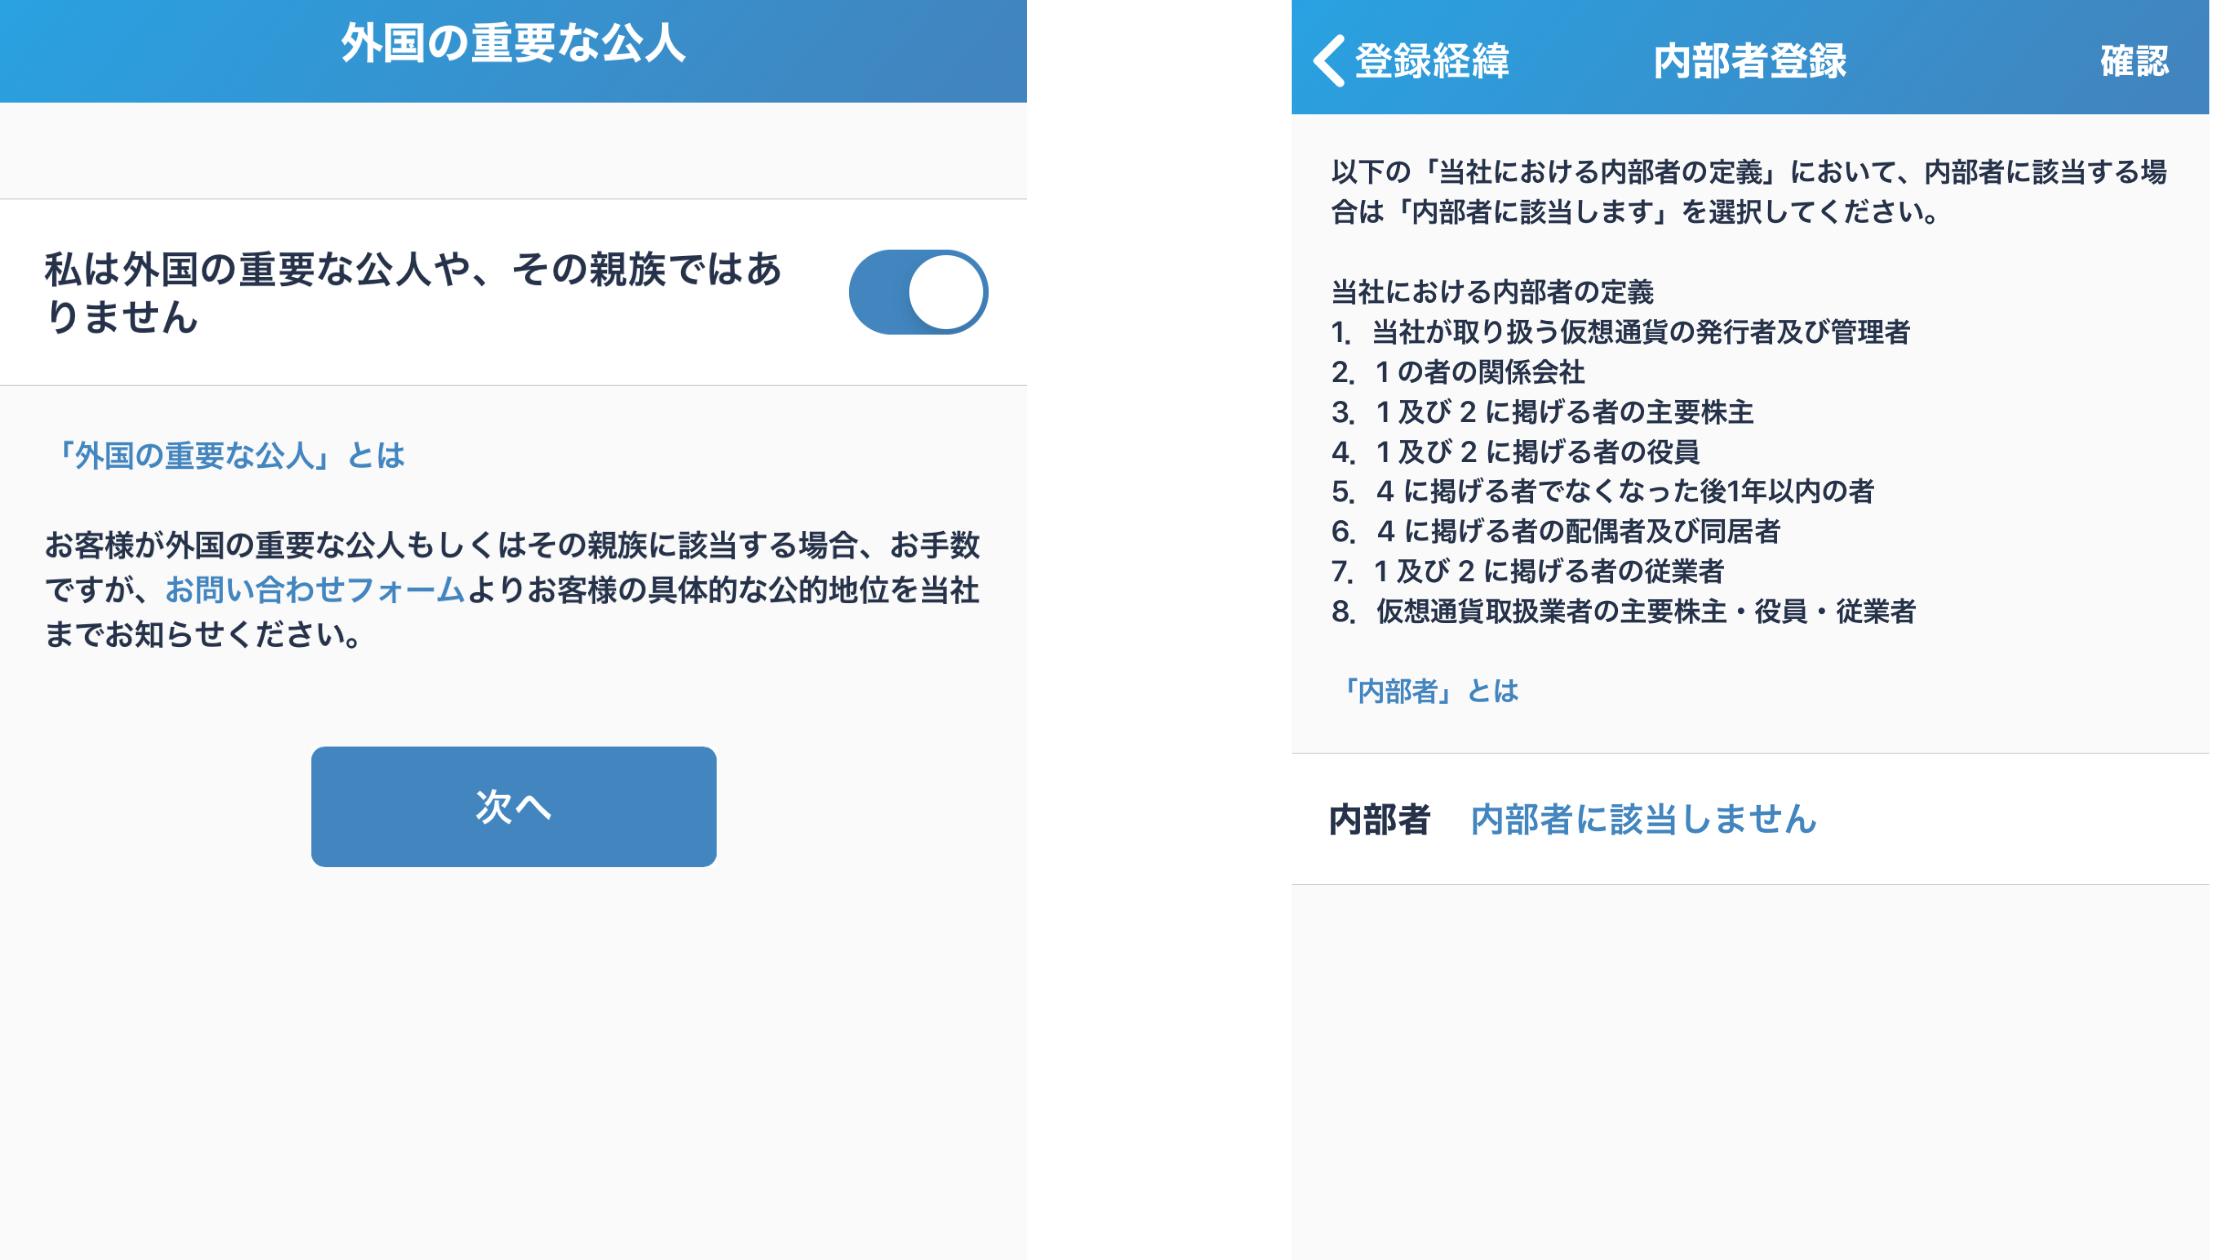 STEP2:ご本人情報の登録(基本情報・取引目的)